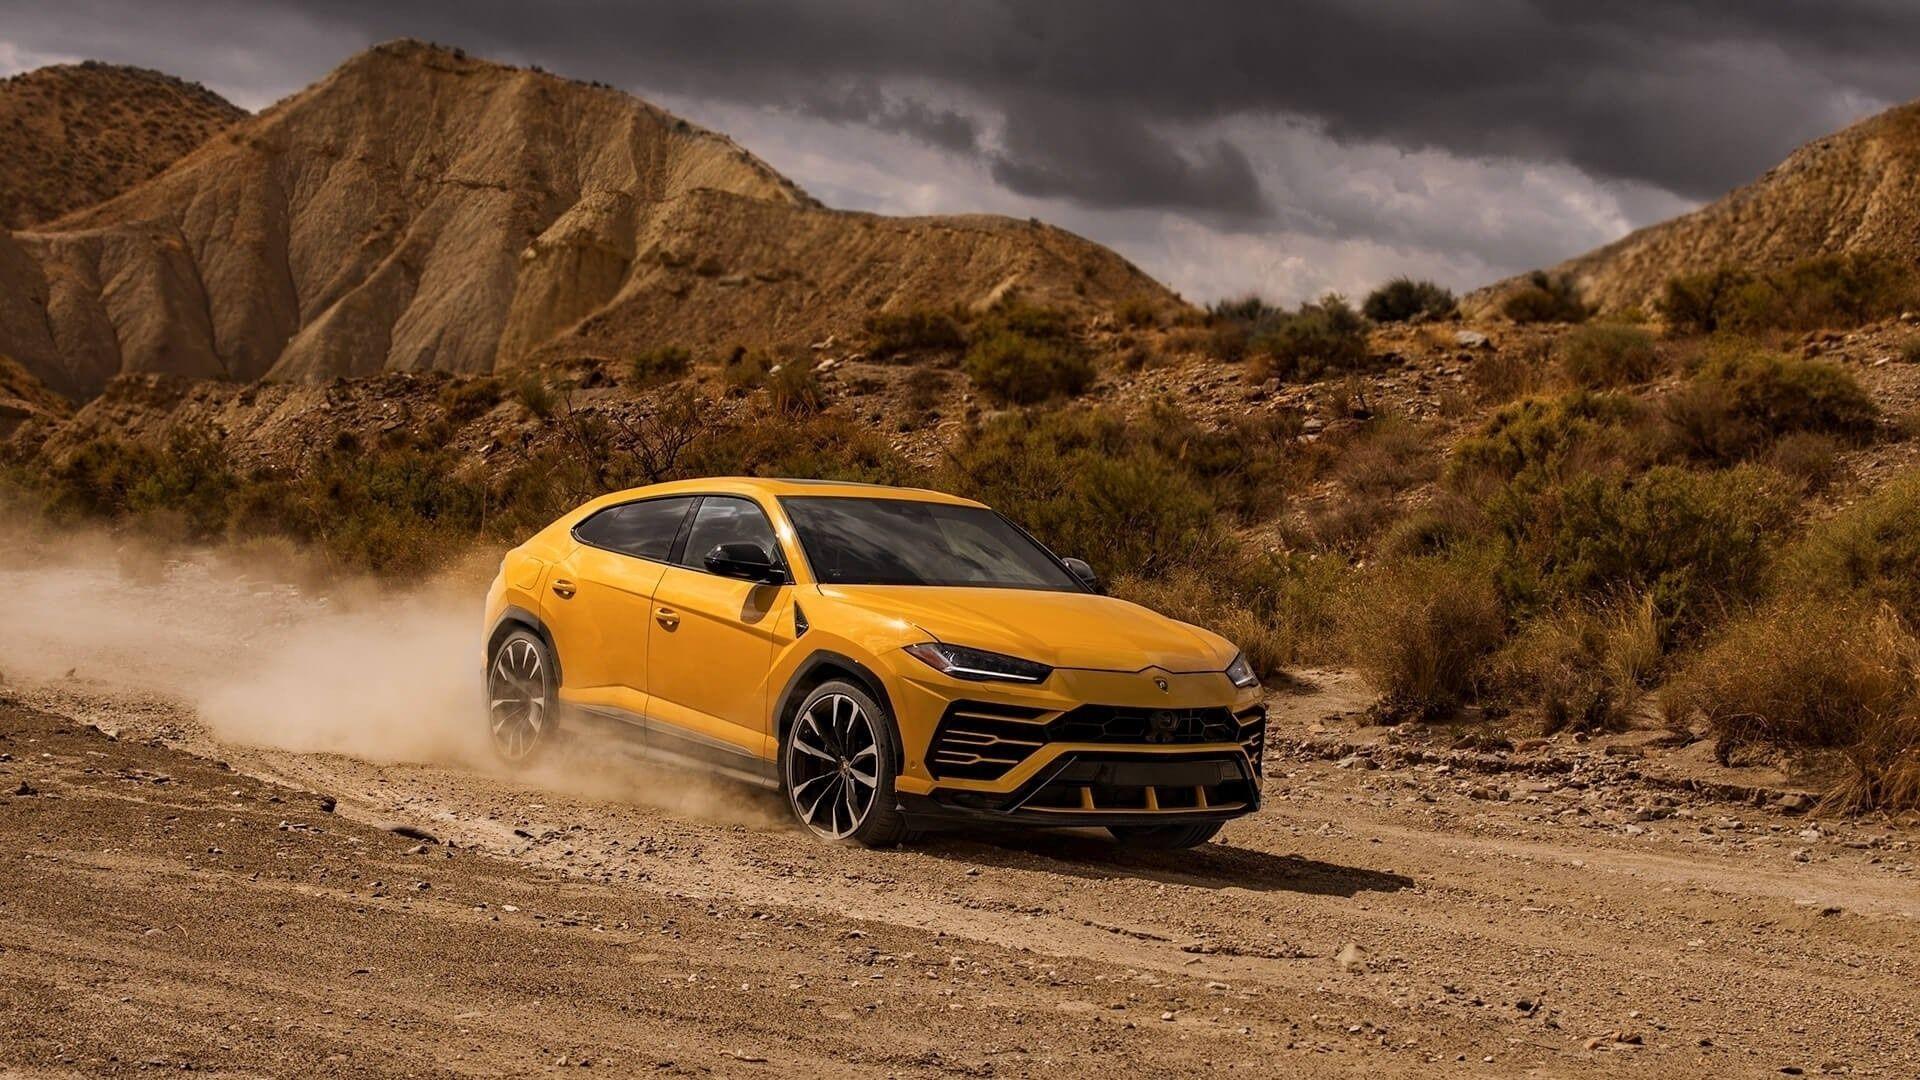 Lamborghini Urus 2019 Gorgeous Suv From Topcar 4k Youtube